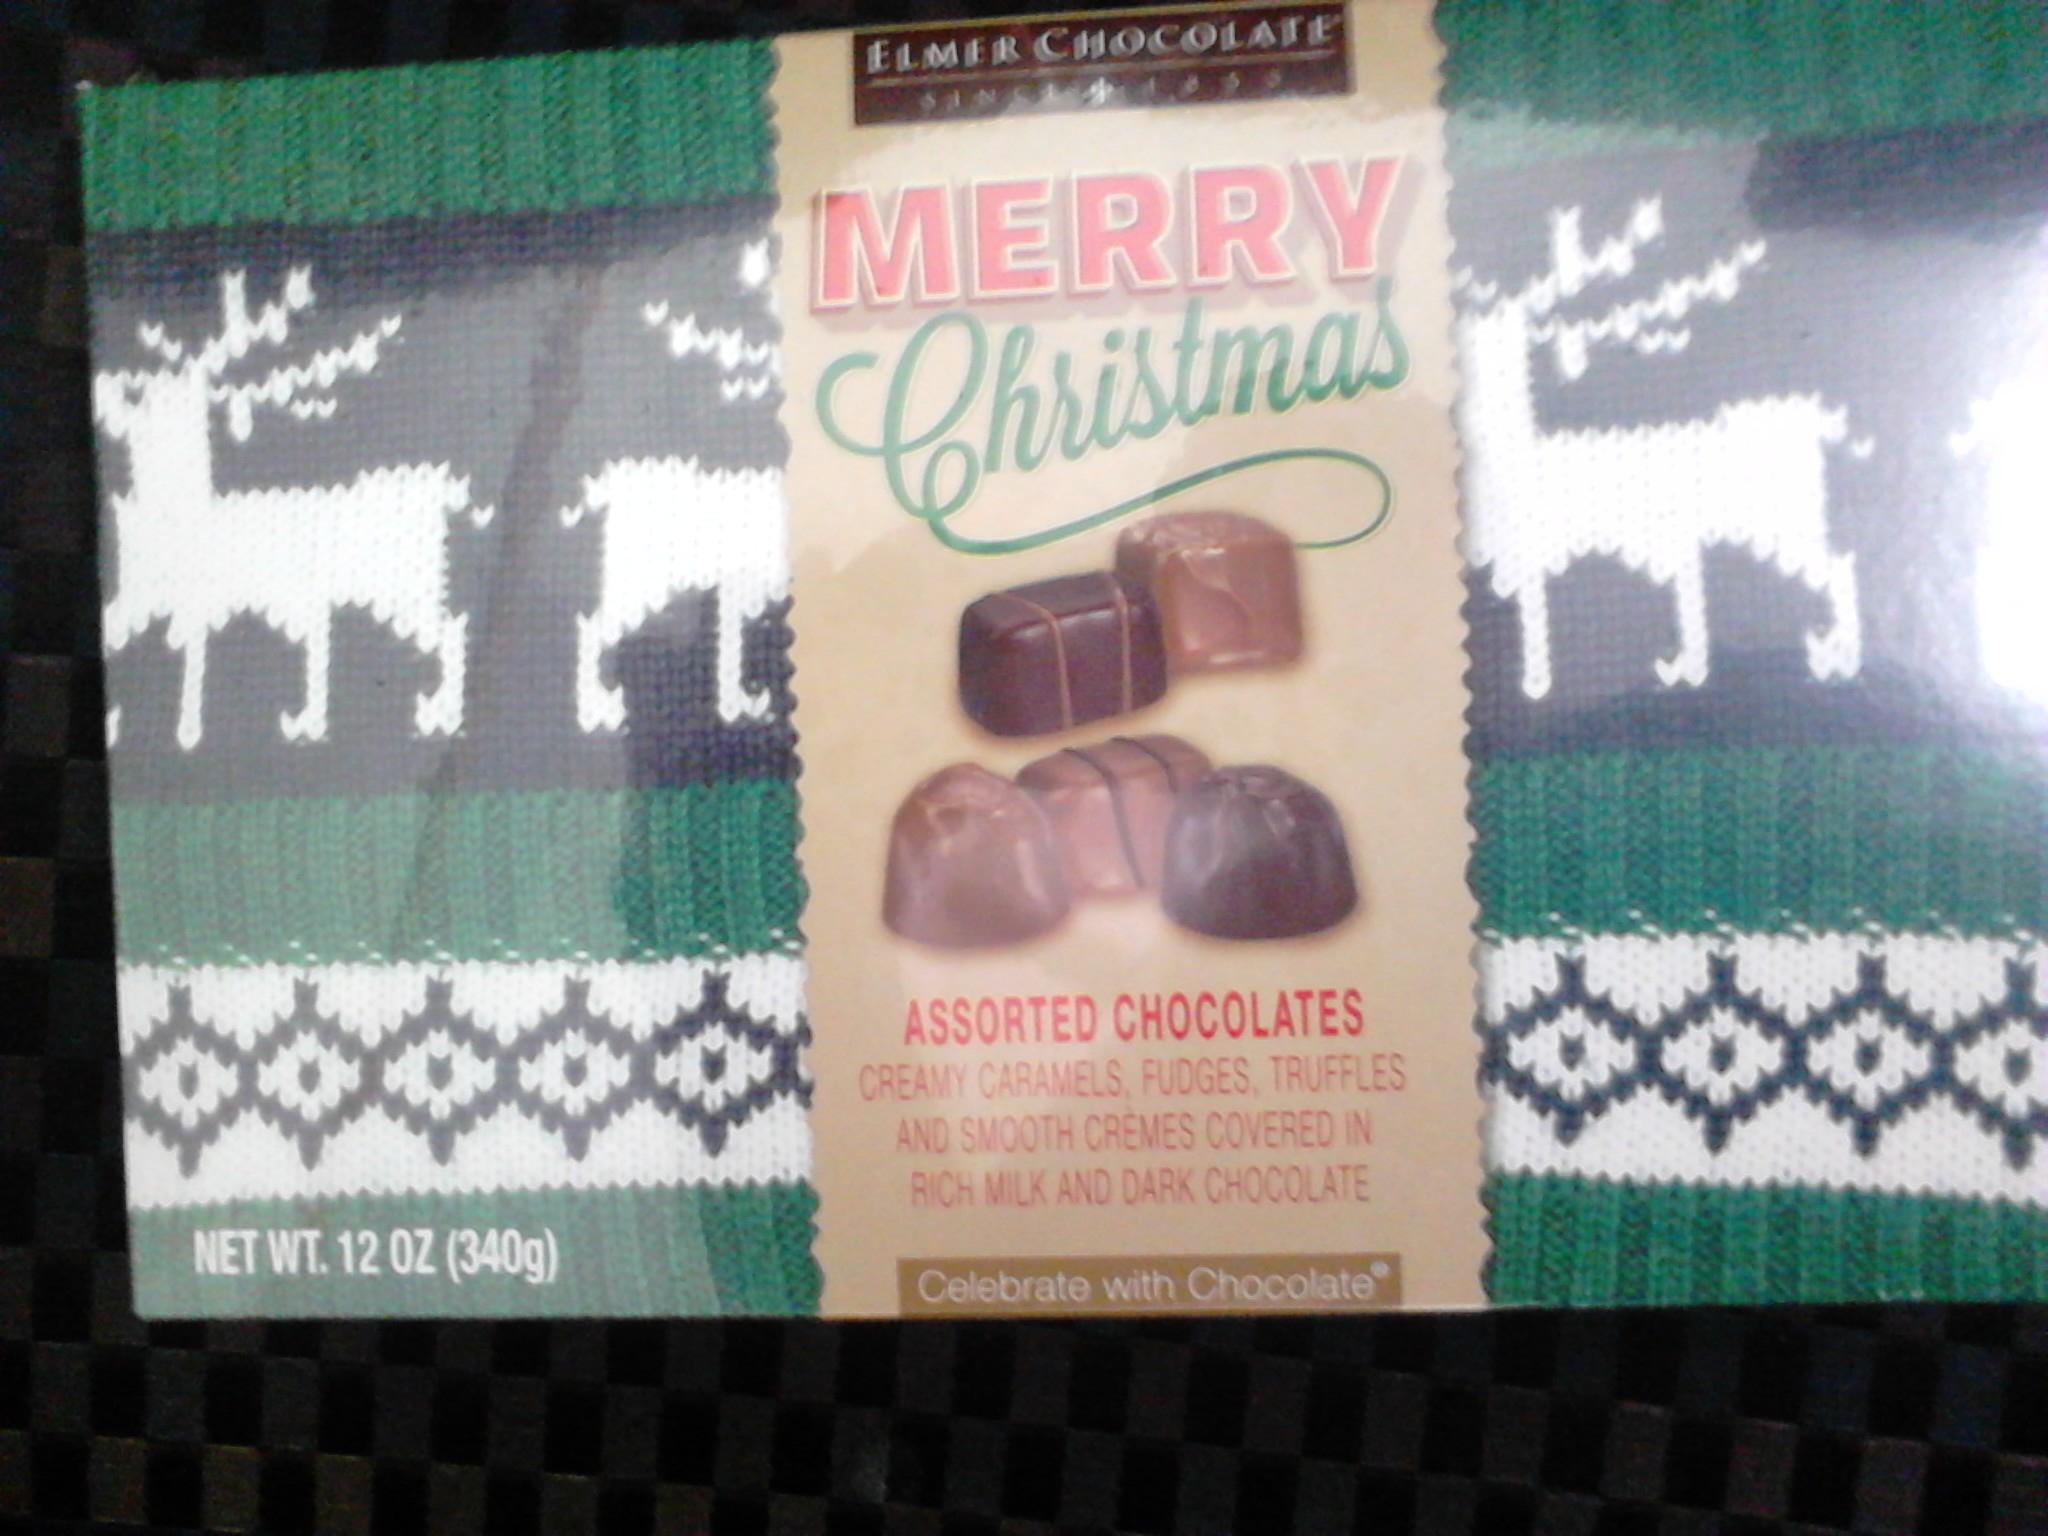 Superama: Caja de Chocolates marca Merry Christmast 340gr $35.03